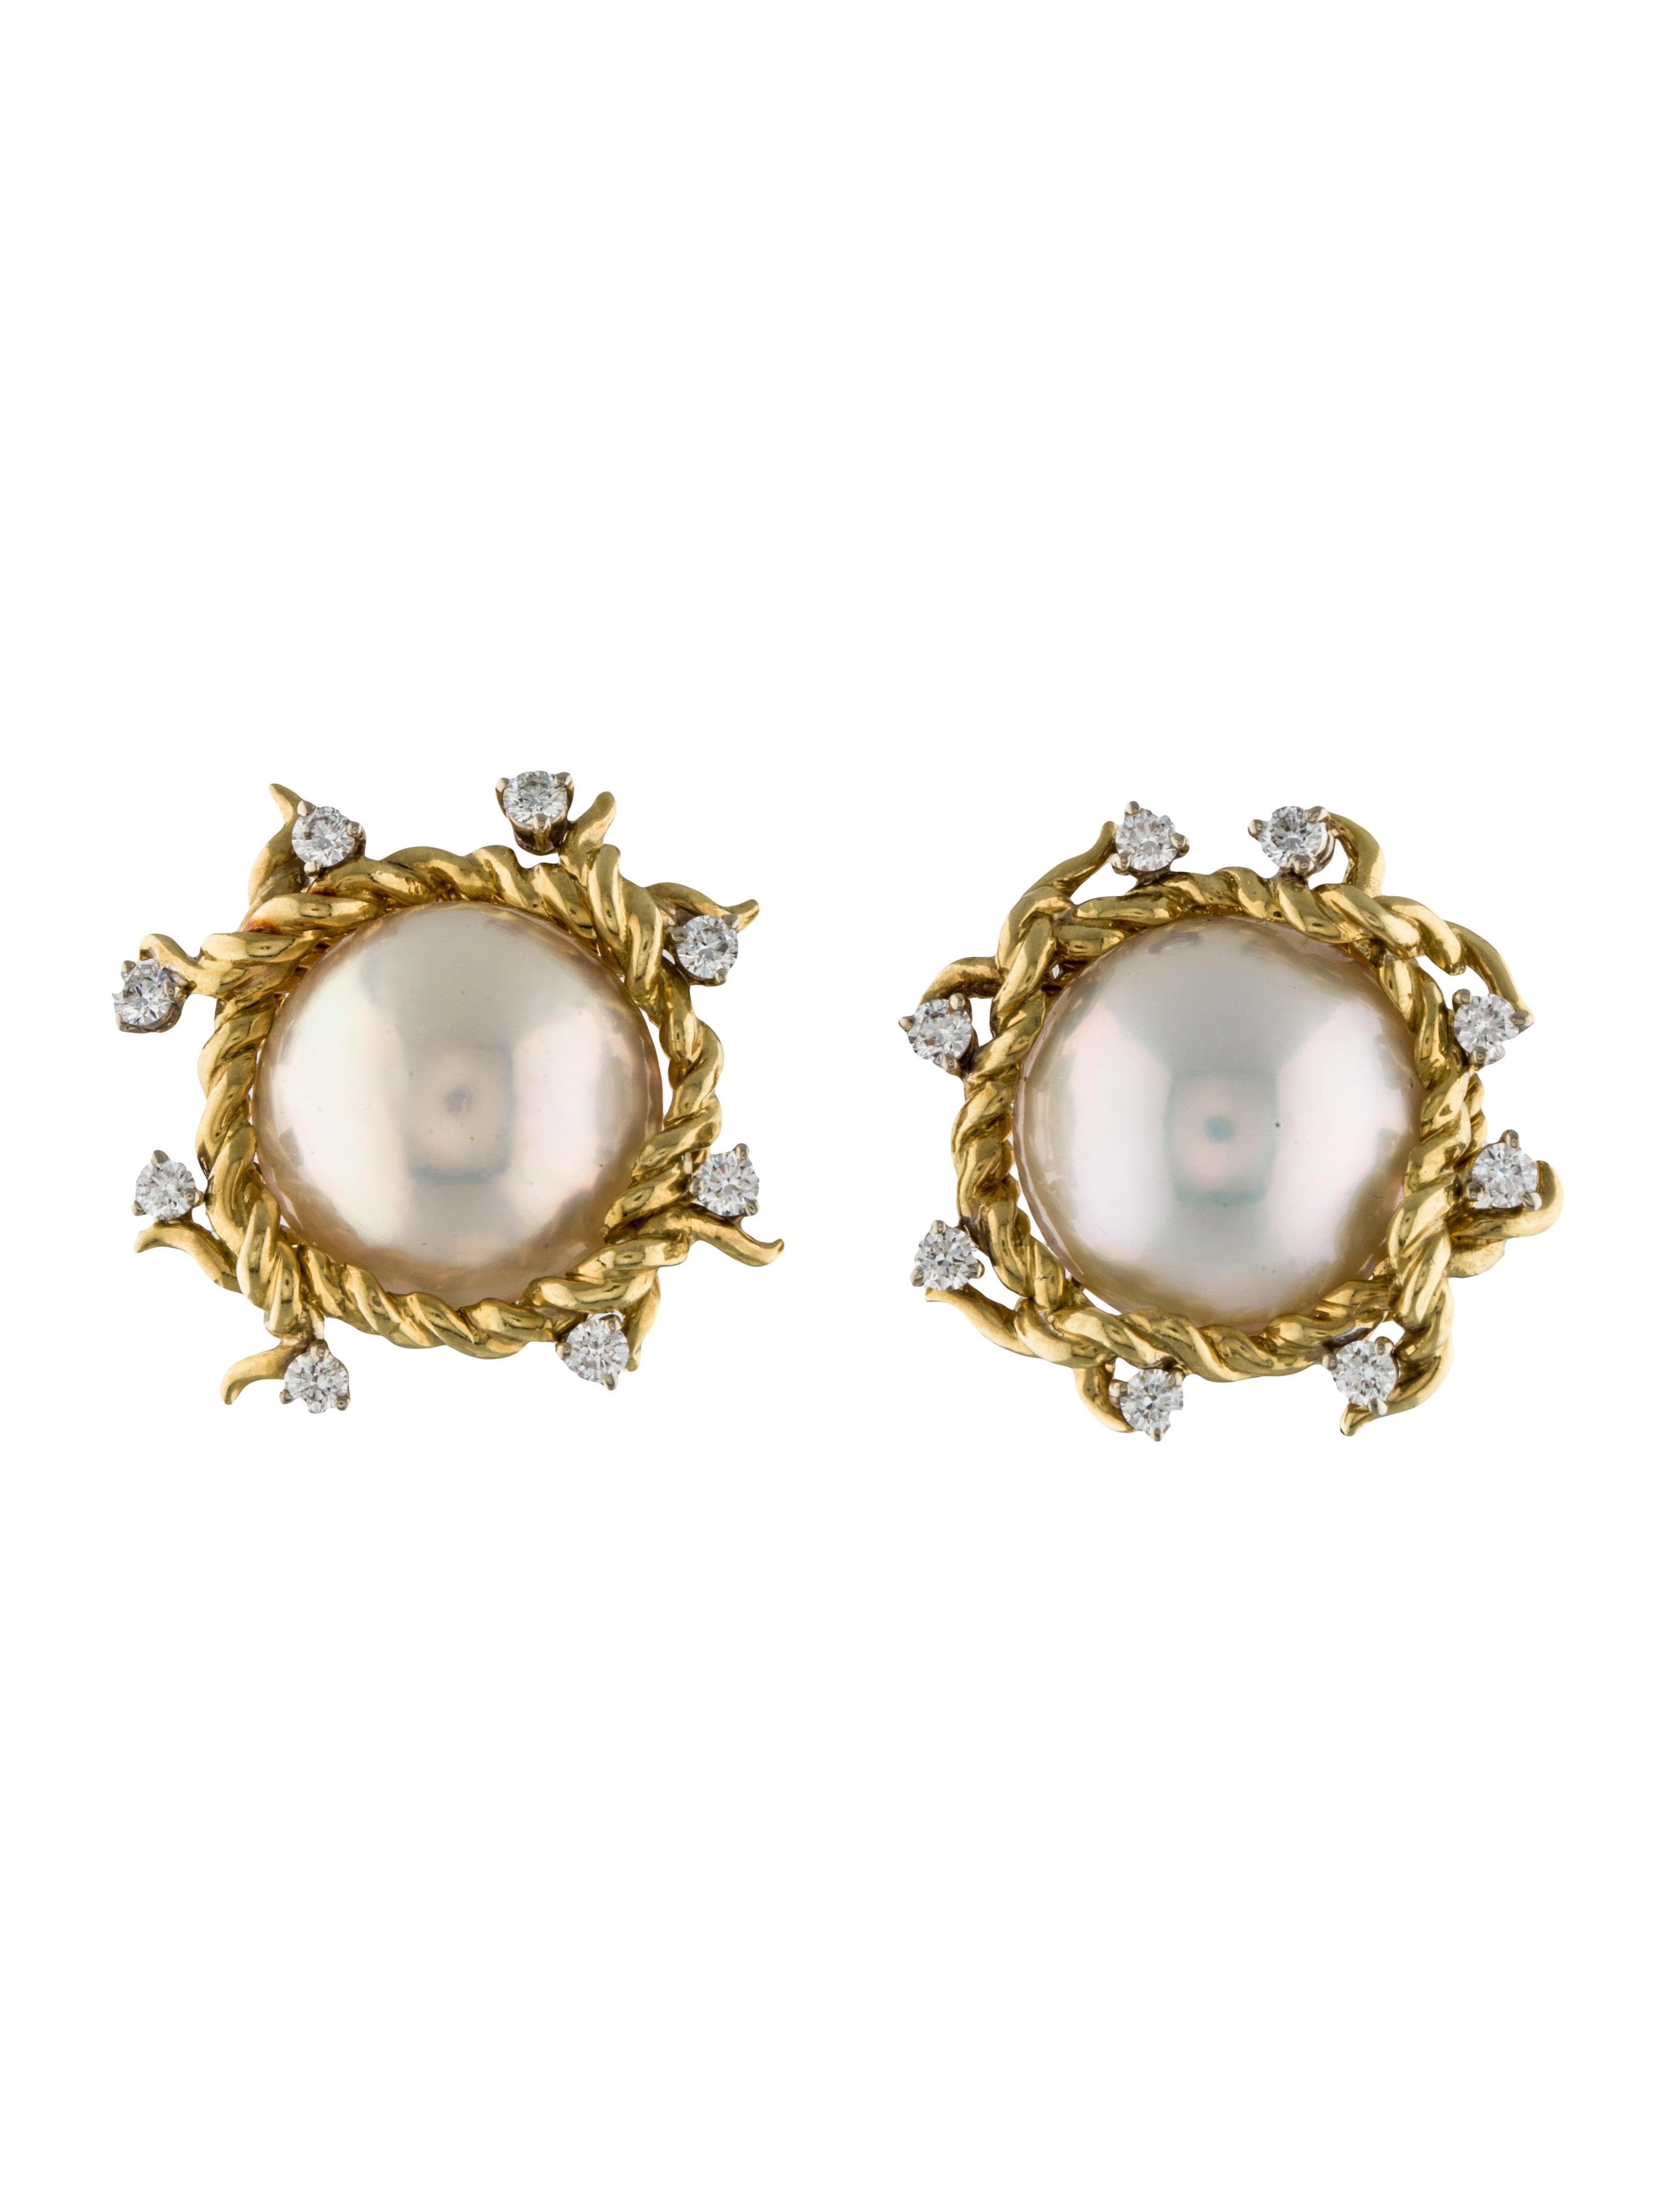 mab 233 pearl earrings earrings fje29212 the